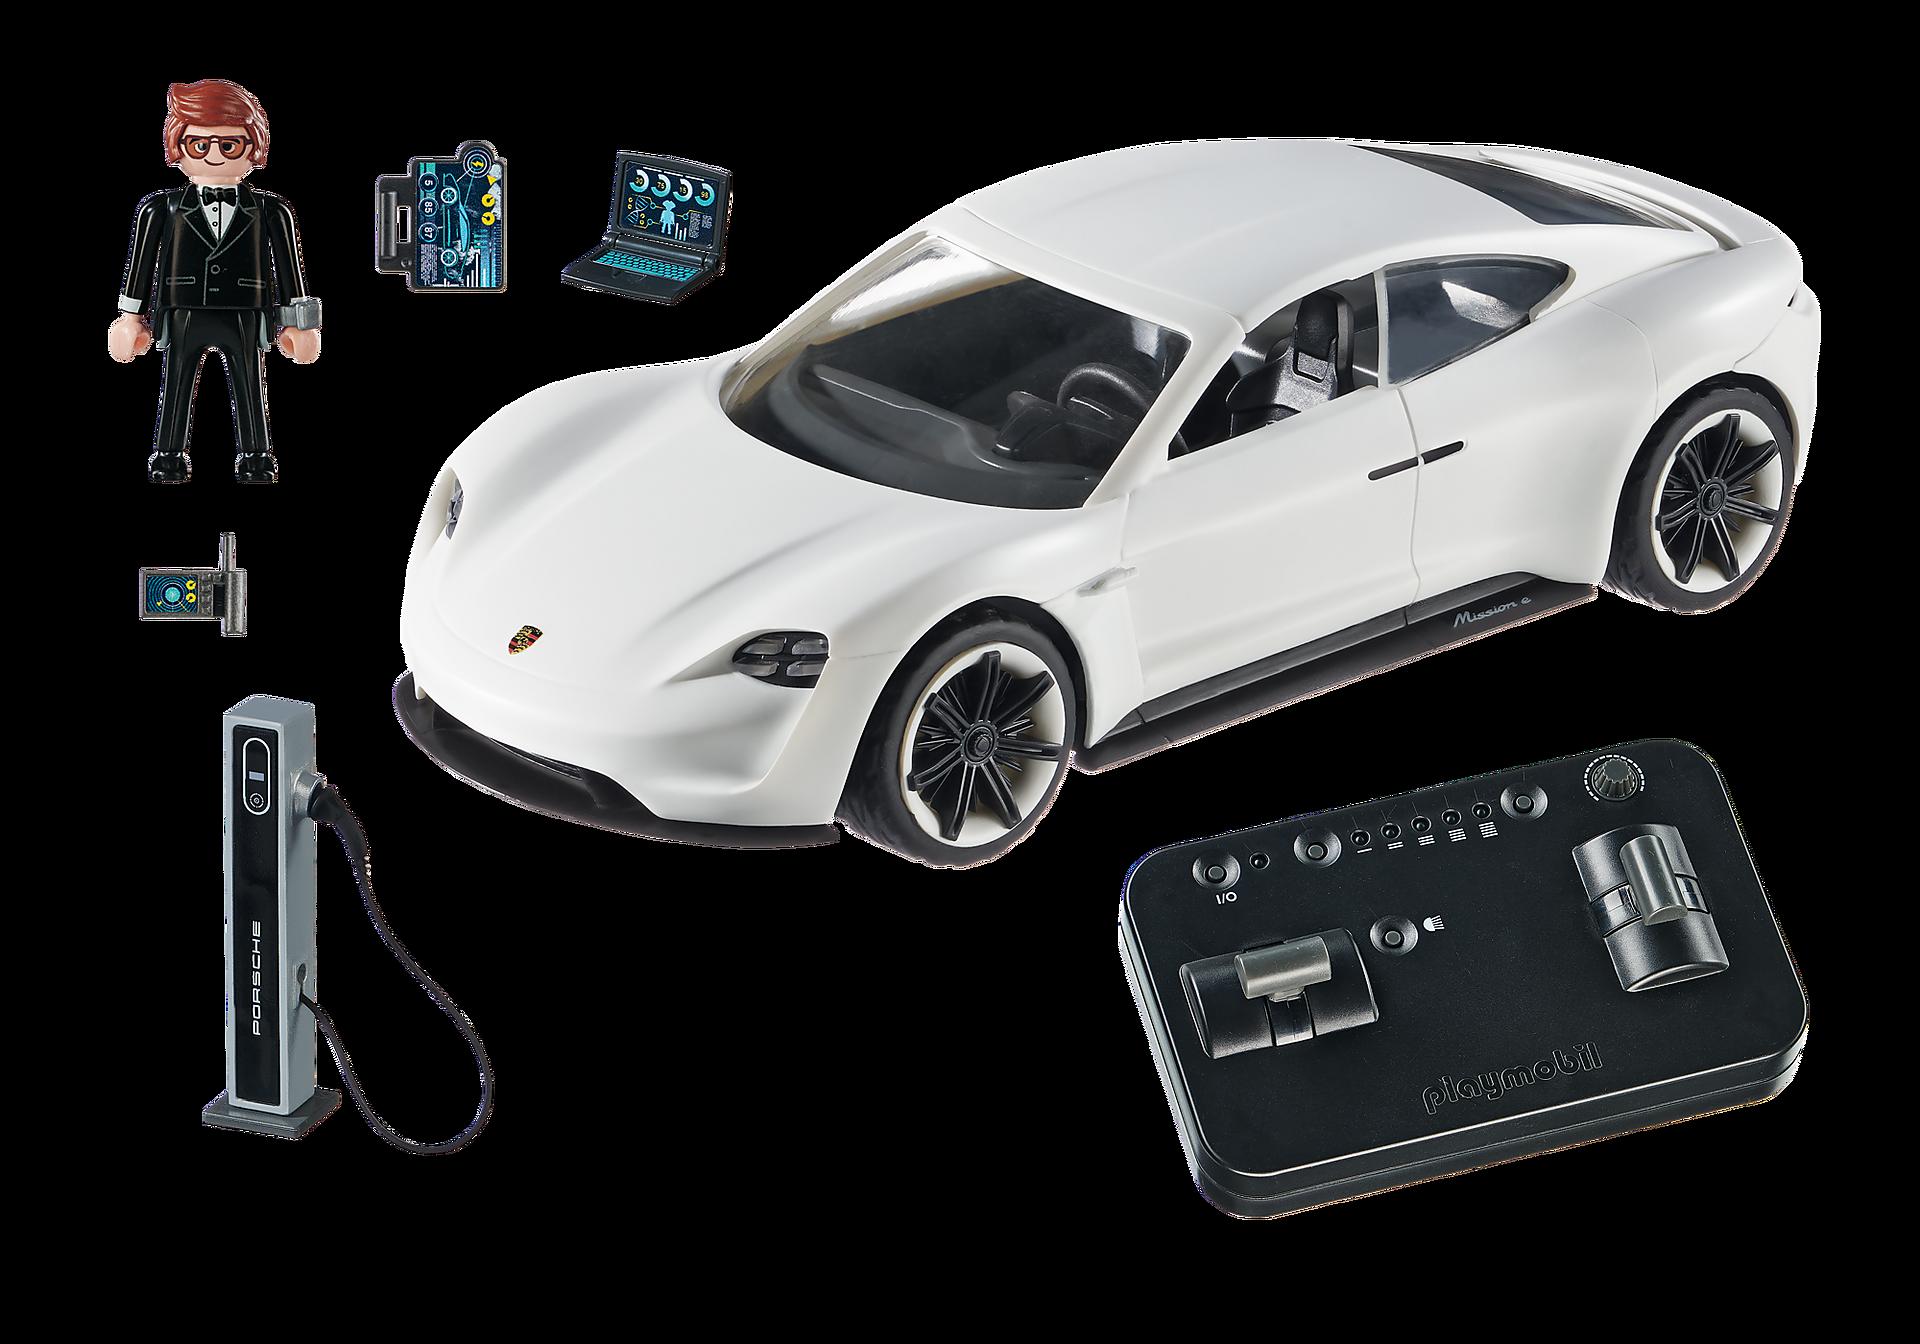 http://media.playmobil.com/i/playmobil/70078_product_box_back/PLAYMOBIL: THE MOVIE Porsche Mission E Rex'a Dasher'a